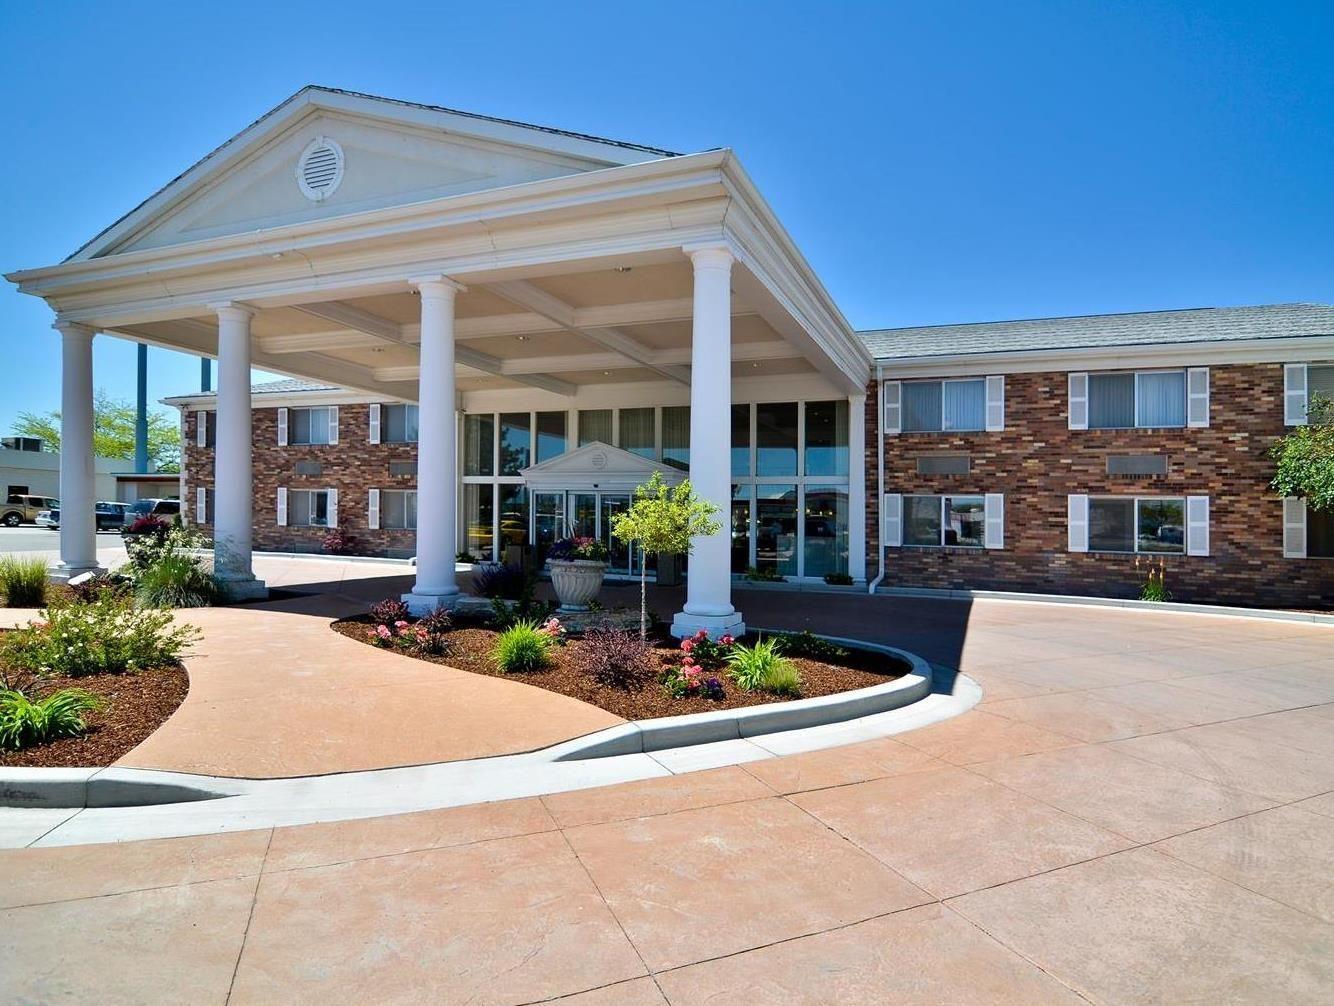 Hotels In Burley Idaho Area Newatvs Info